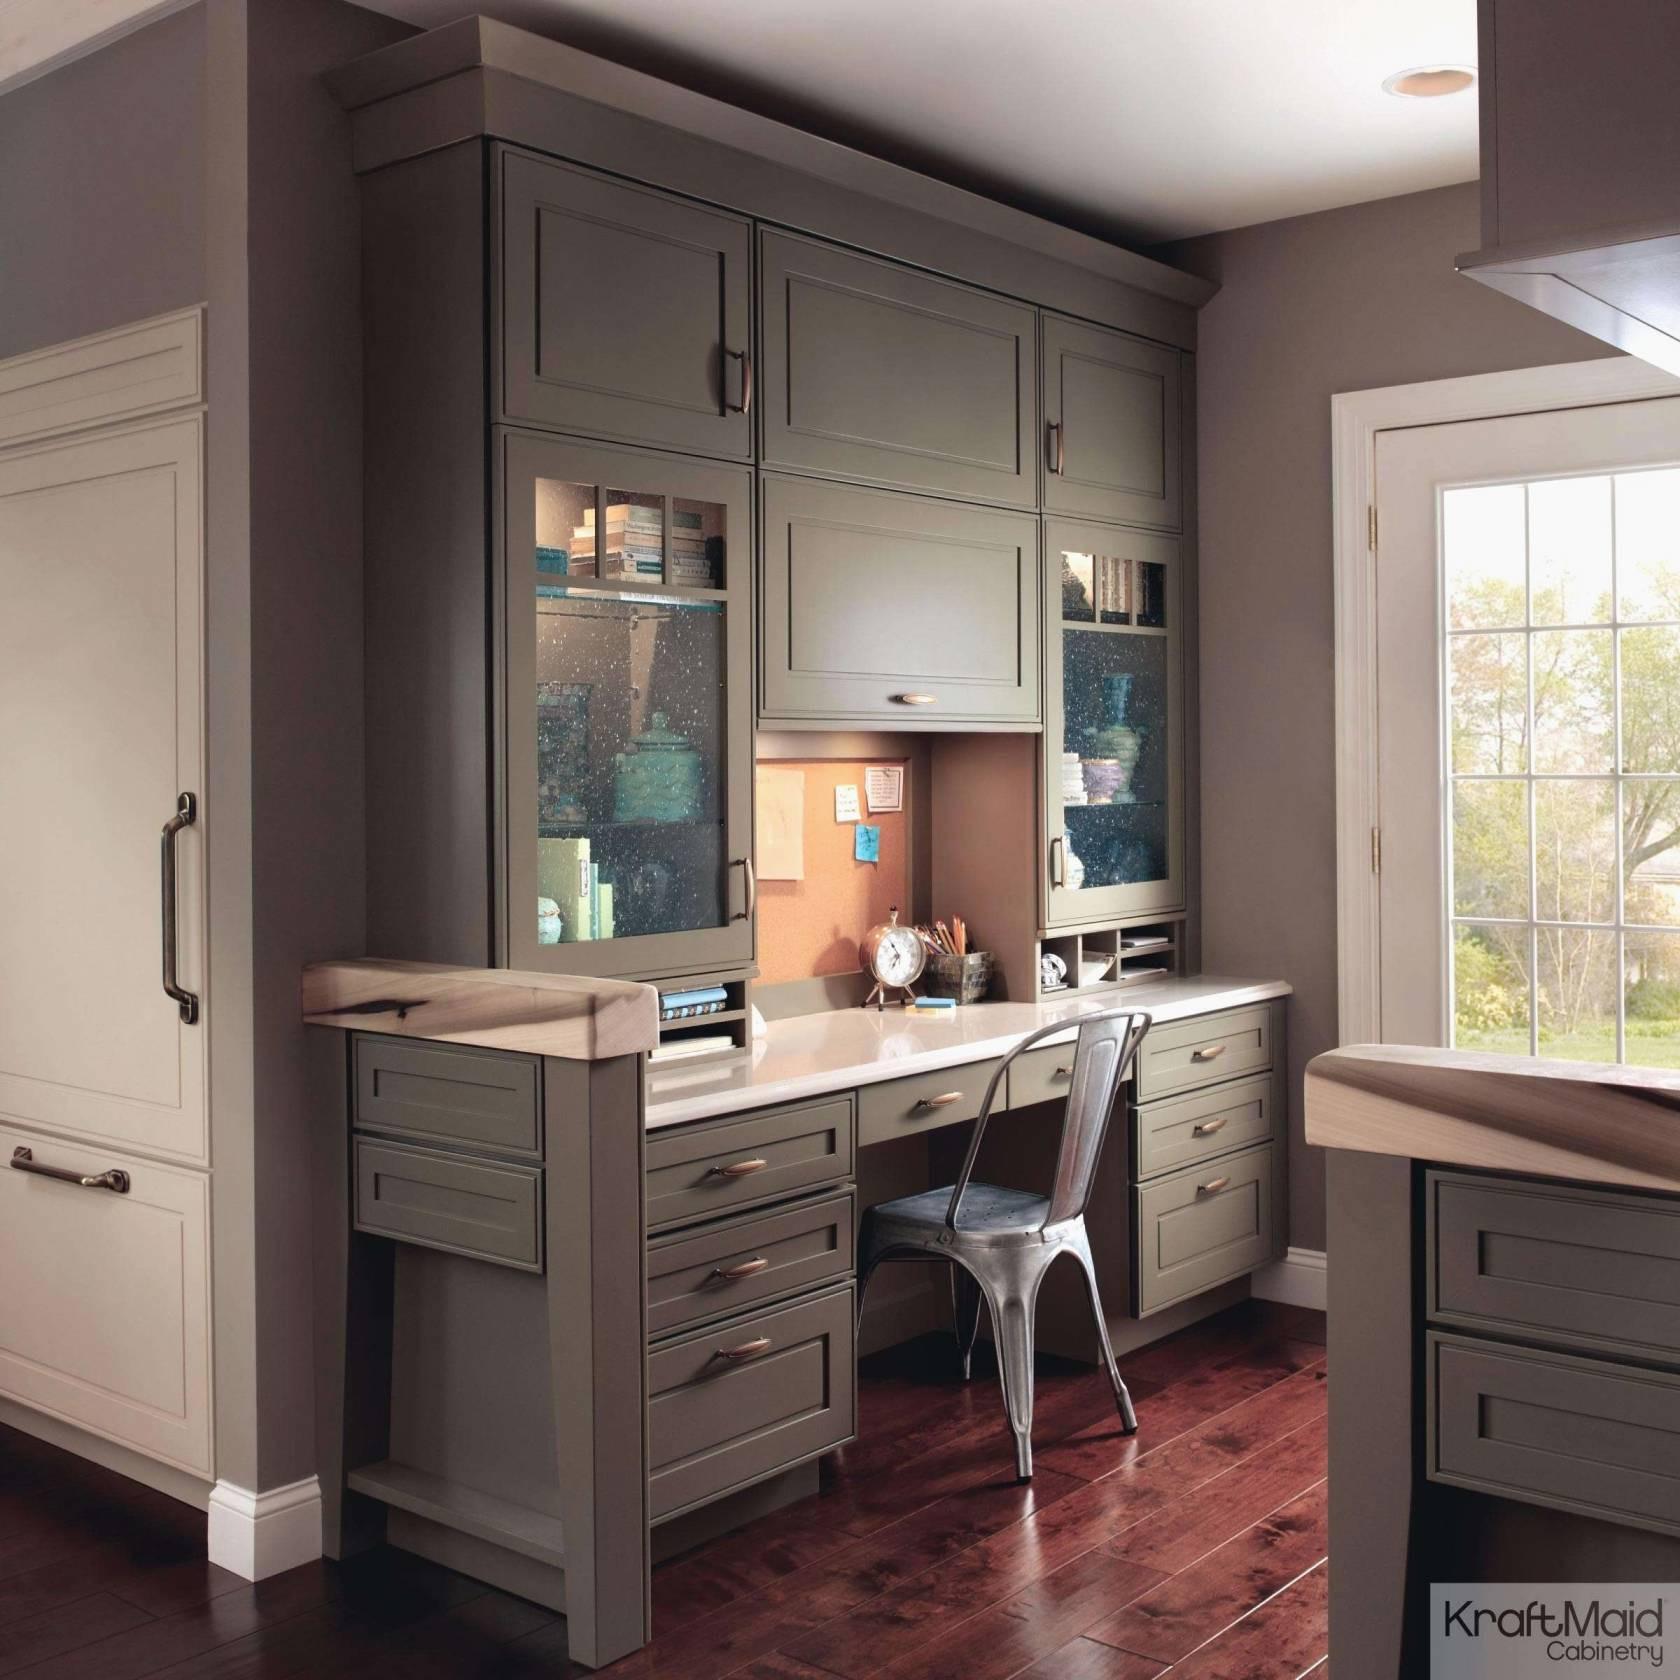 how do you refinish hardwood floors yourself of 15 luxury kitchen cabinets refinishing do it yourself www inside cabinets refinishing do it yourself 2018